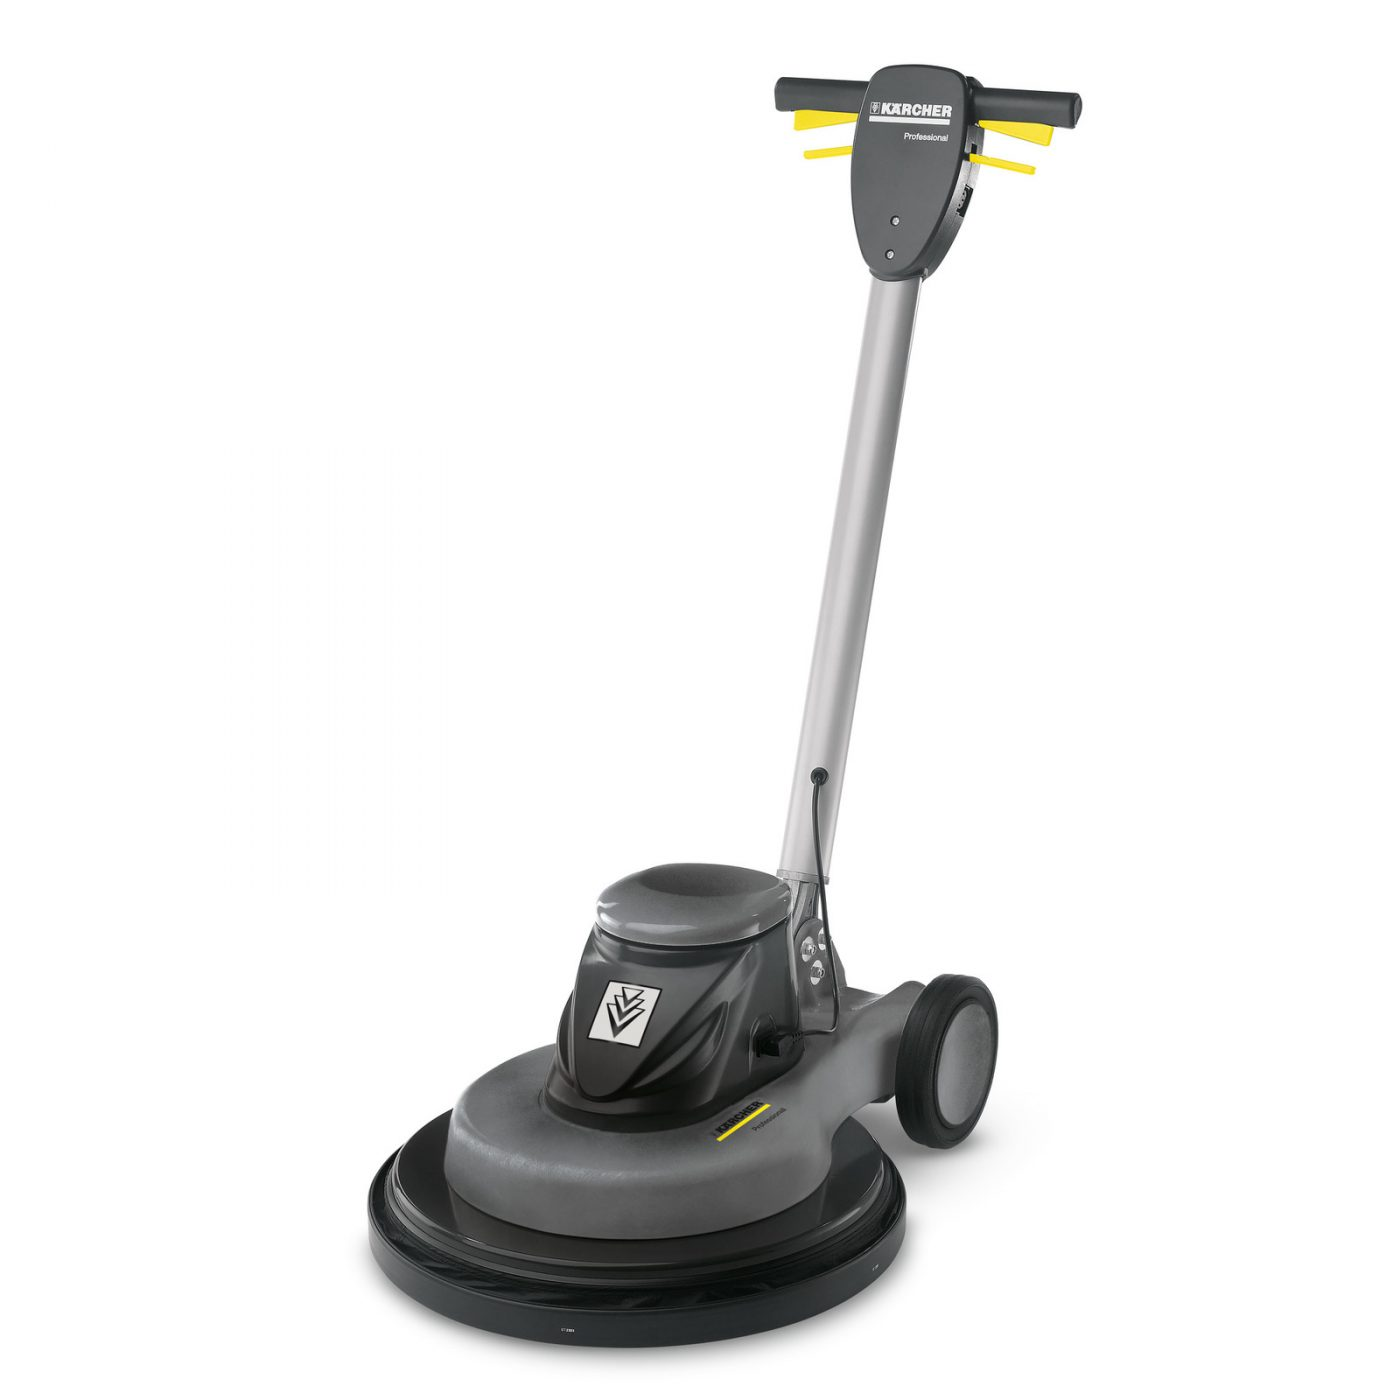 KARCHER 1.291-141.0 - 50/1500 C BDP Scrubber